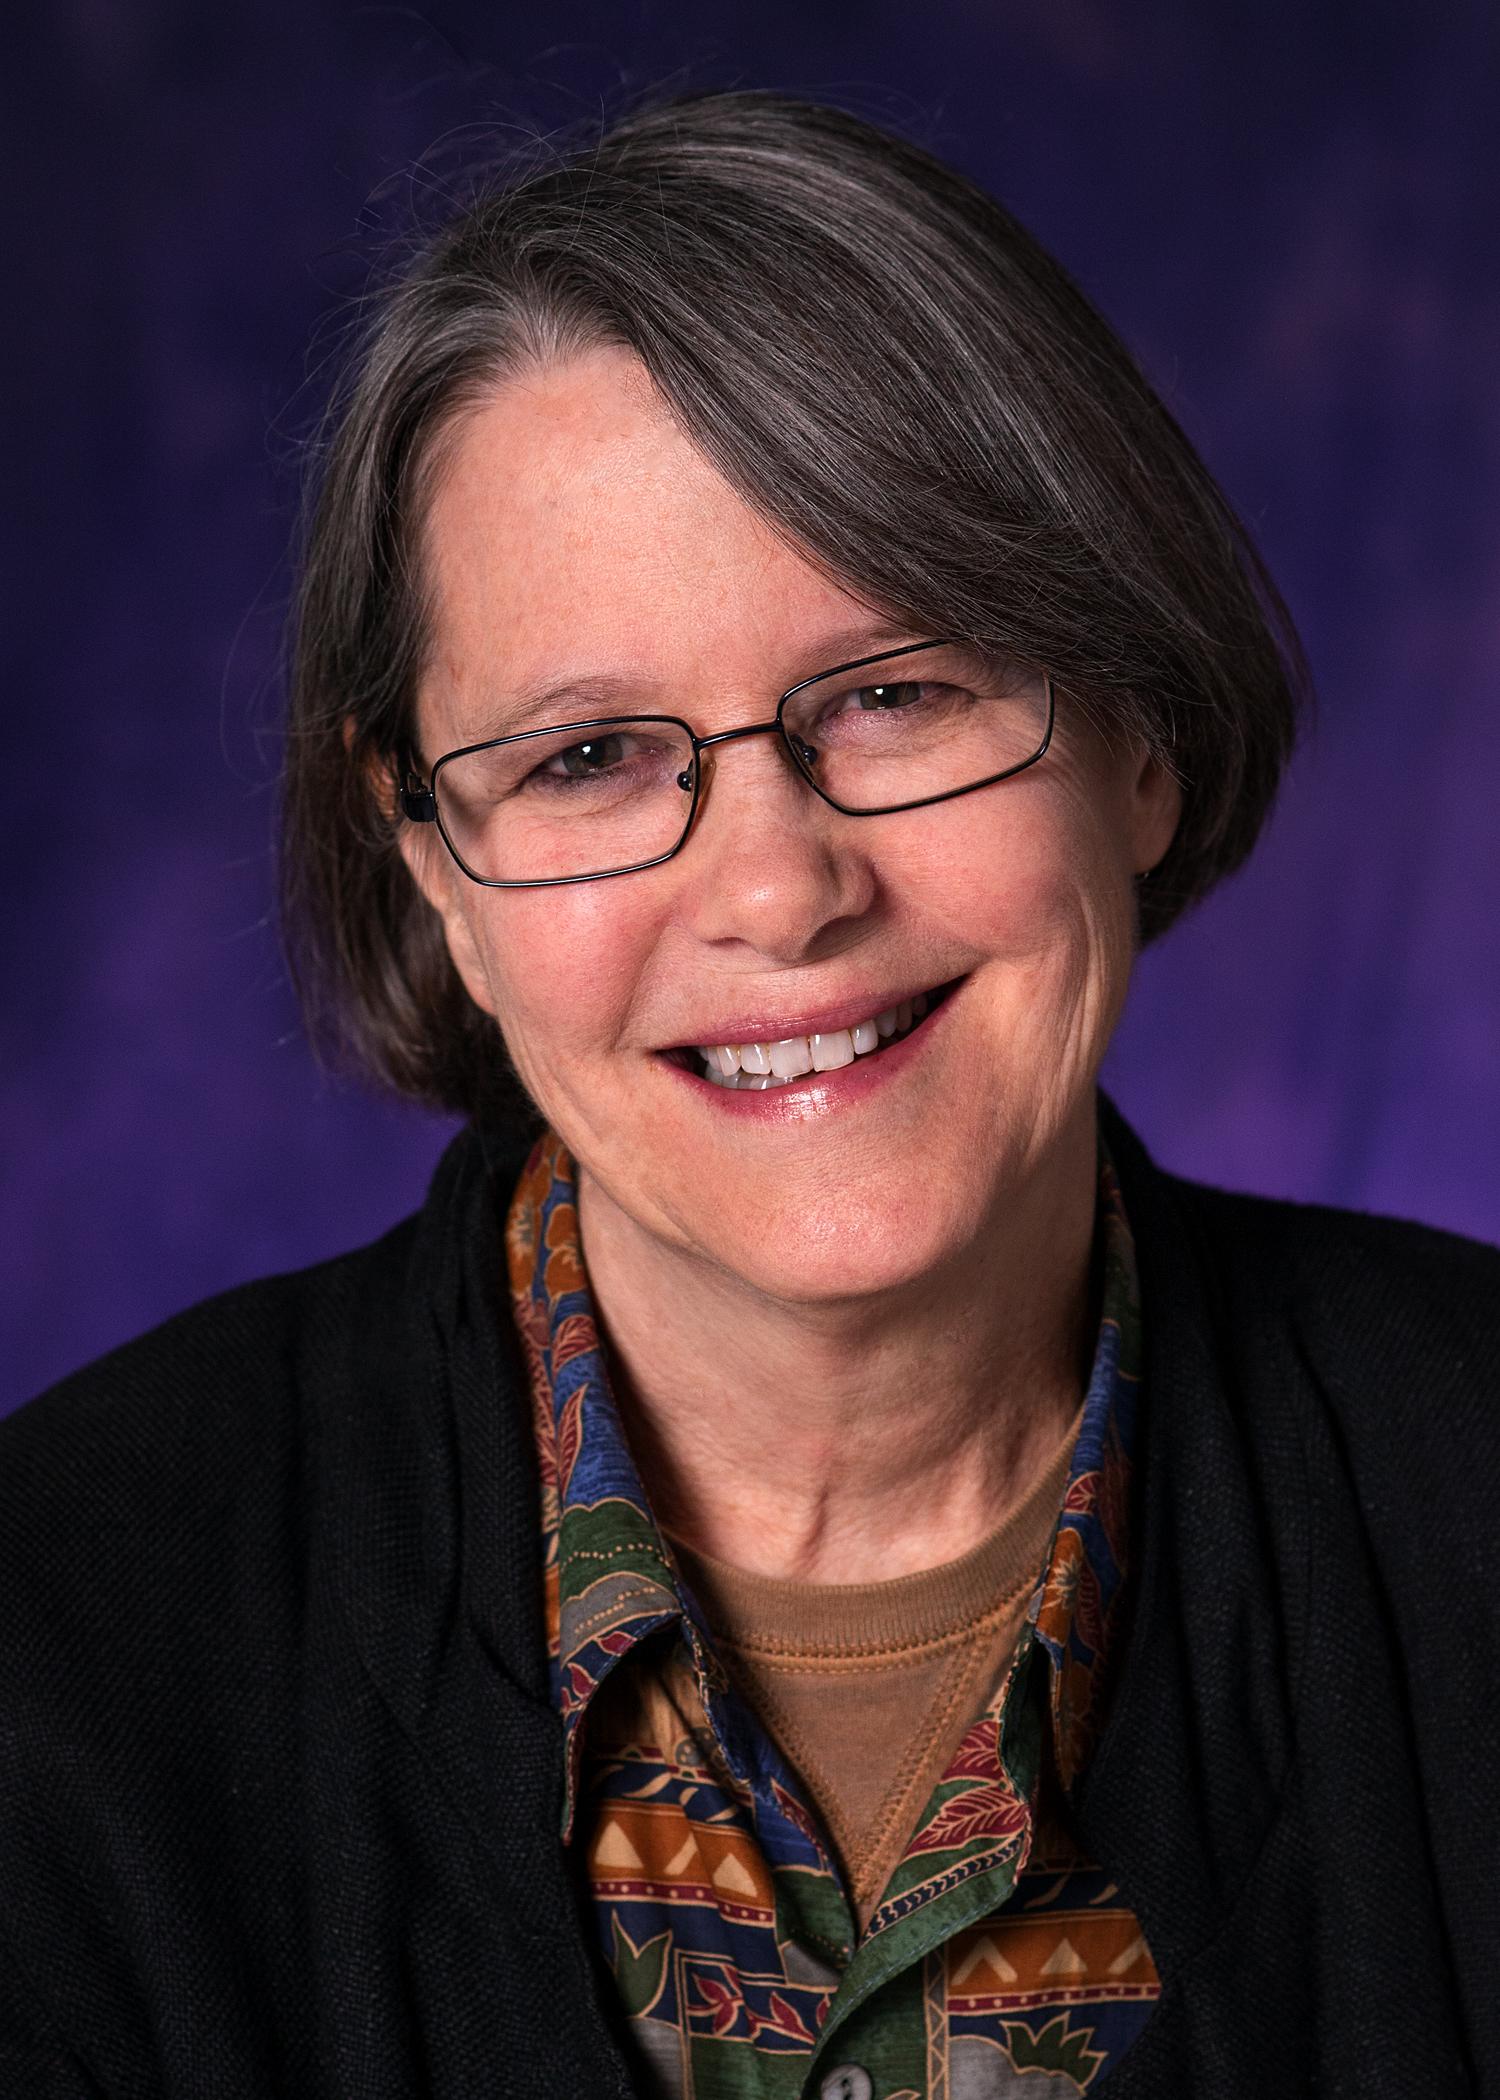 Headshot of Glenda Pearson